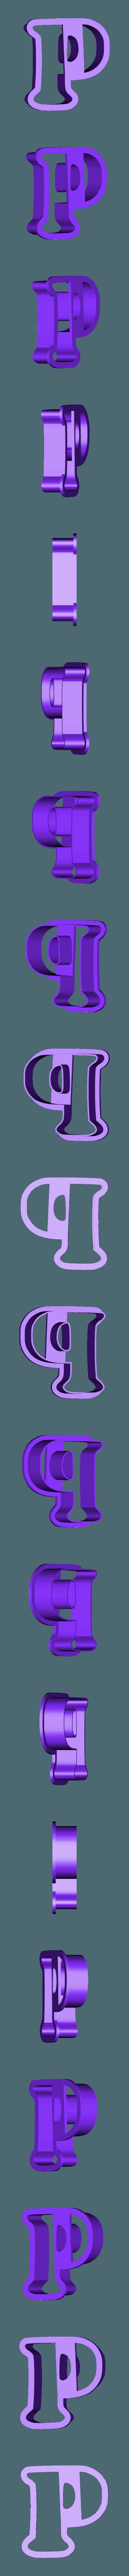 p.stl Download free STL file A-Z alphabet cookie cutter • 3D printer design, BlackSand3DMaker